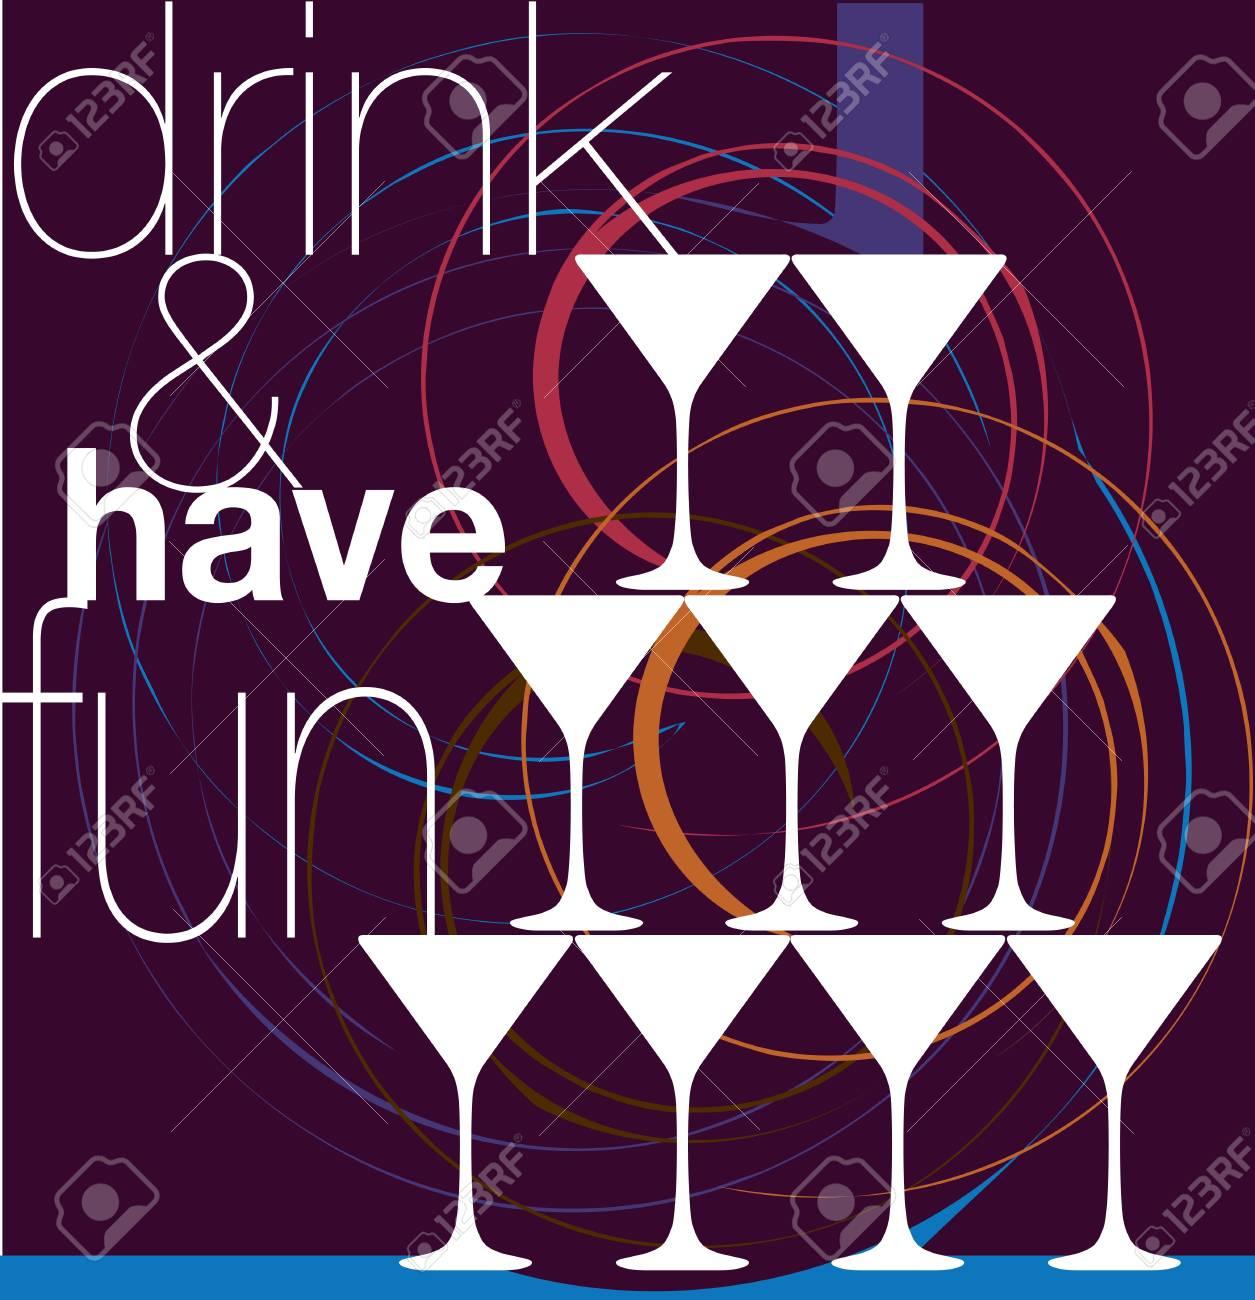 Drink & have fun. Vector illustration Stock Vector - 10915068